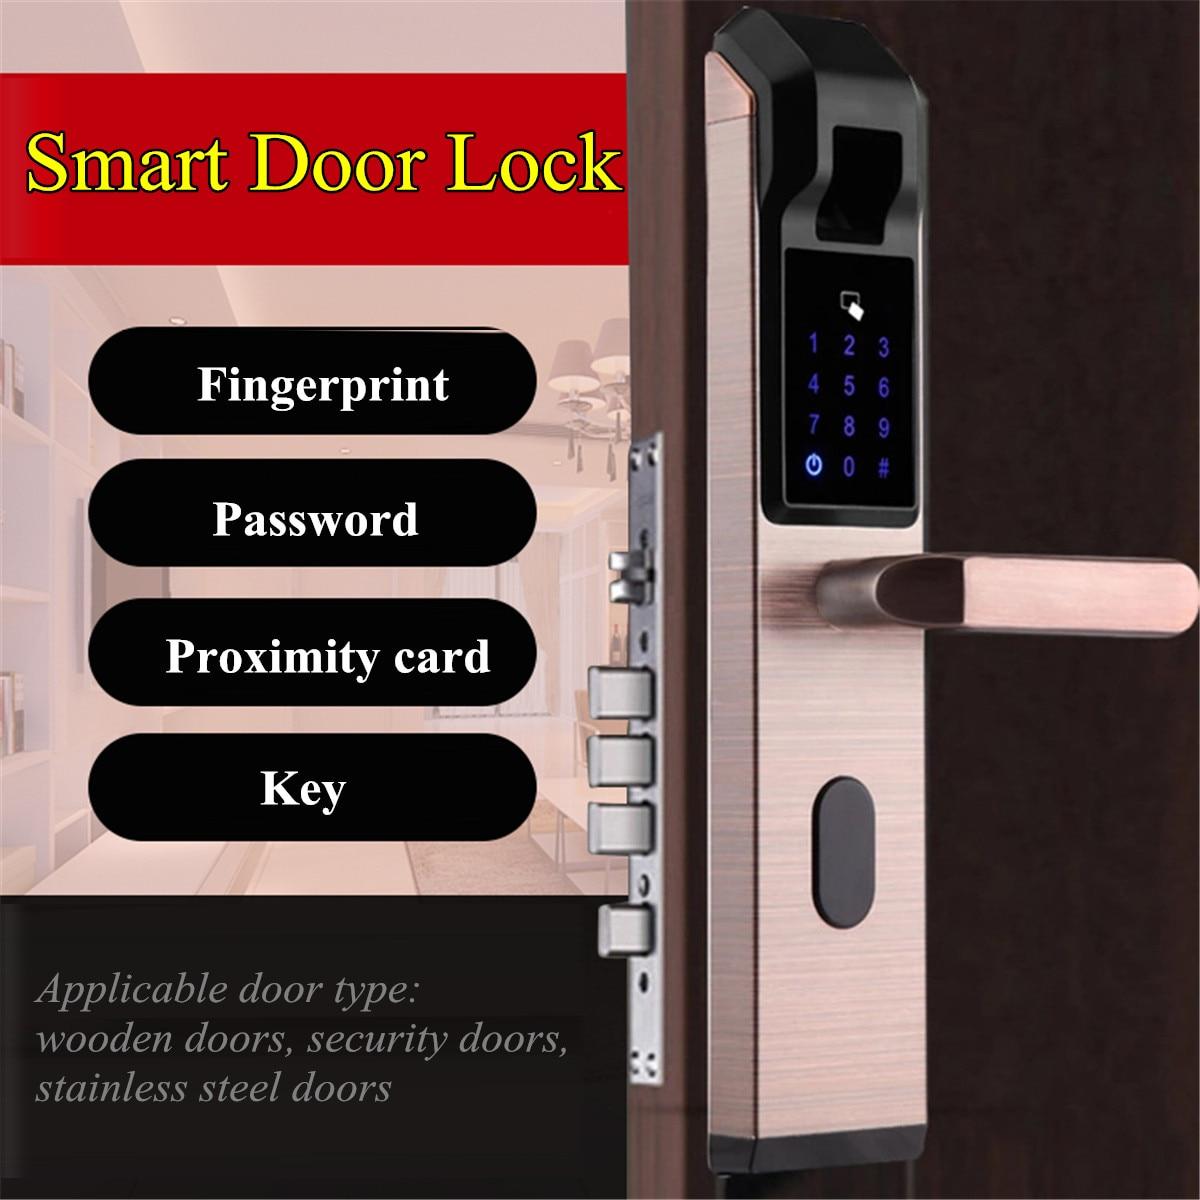 Security Smart Electronic Door Lock Fingerprint Password Access Anti theft Lock Access Control System Set House Apartment 4 Ways